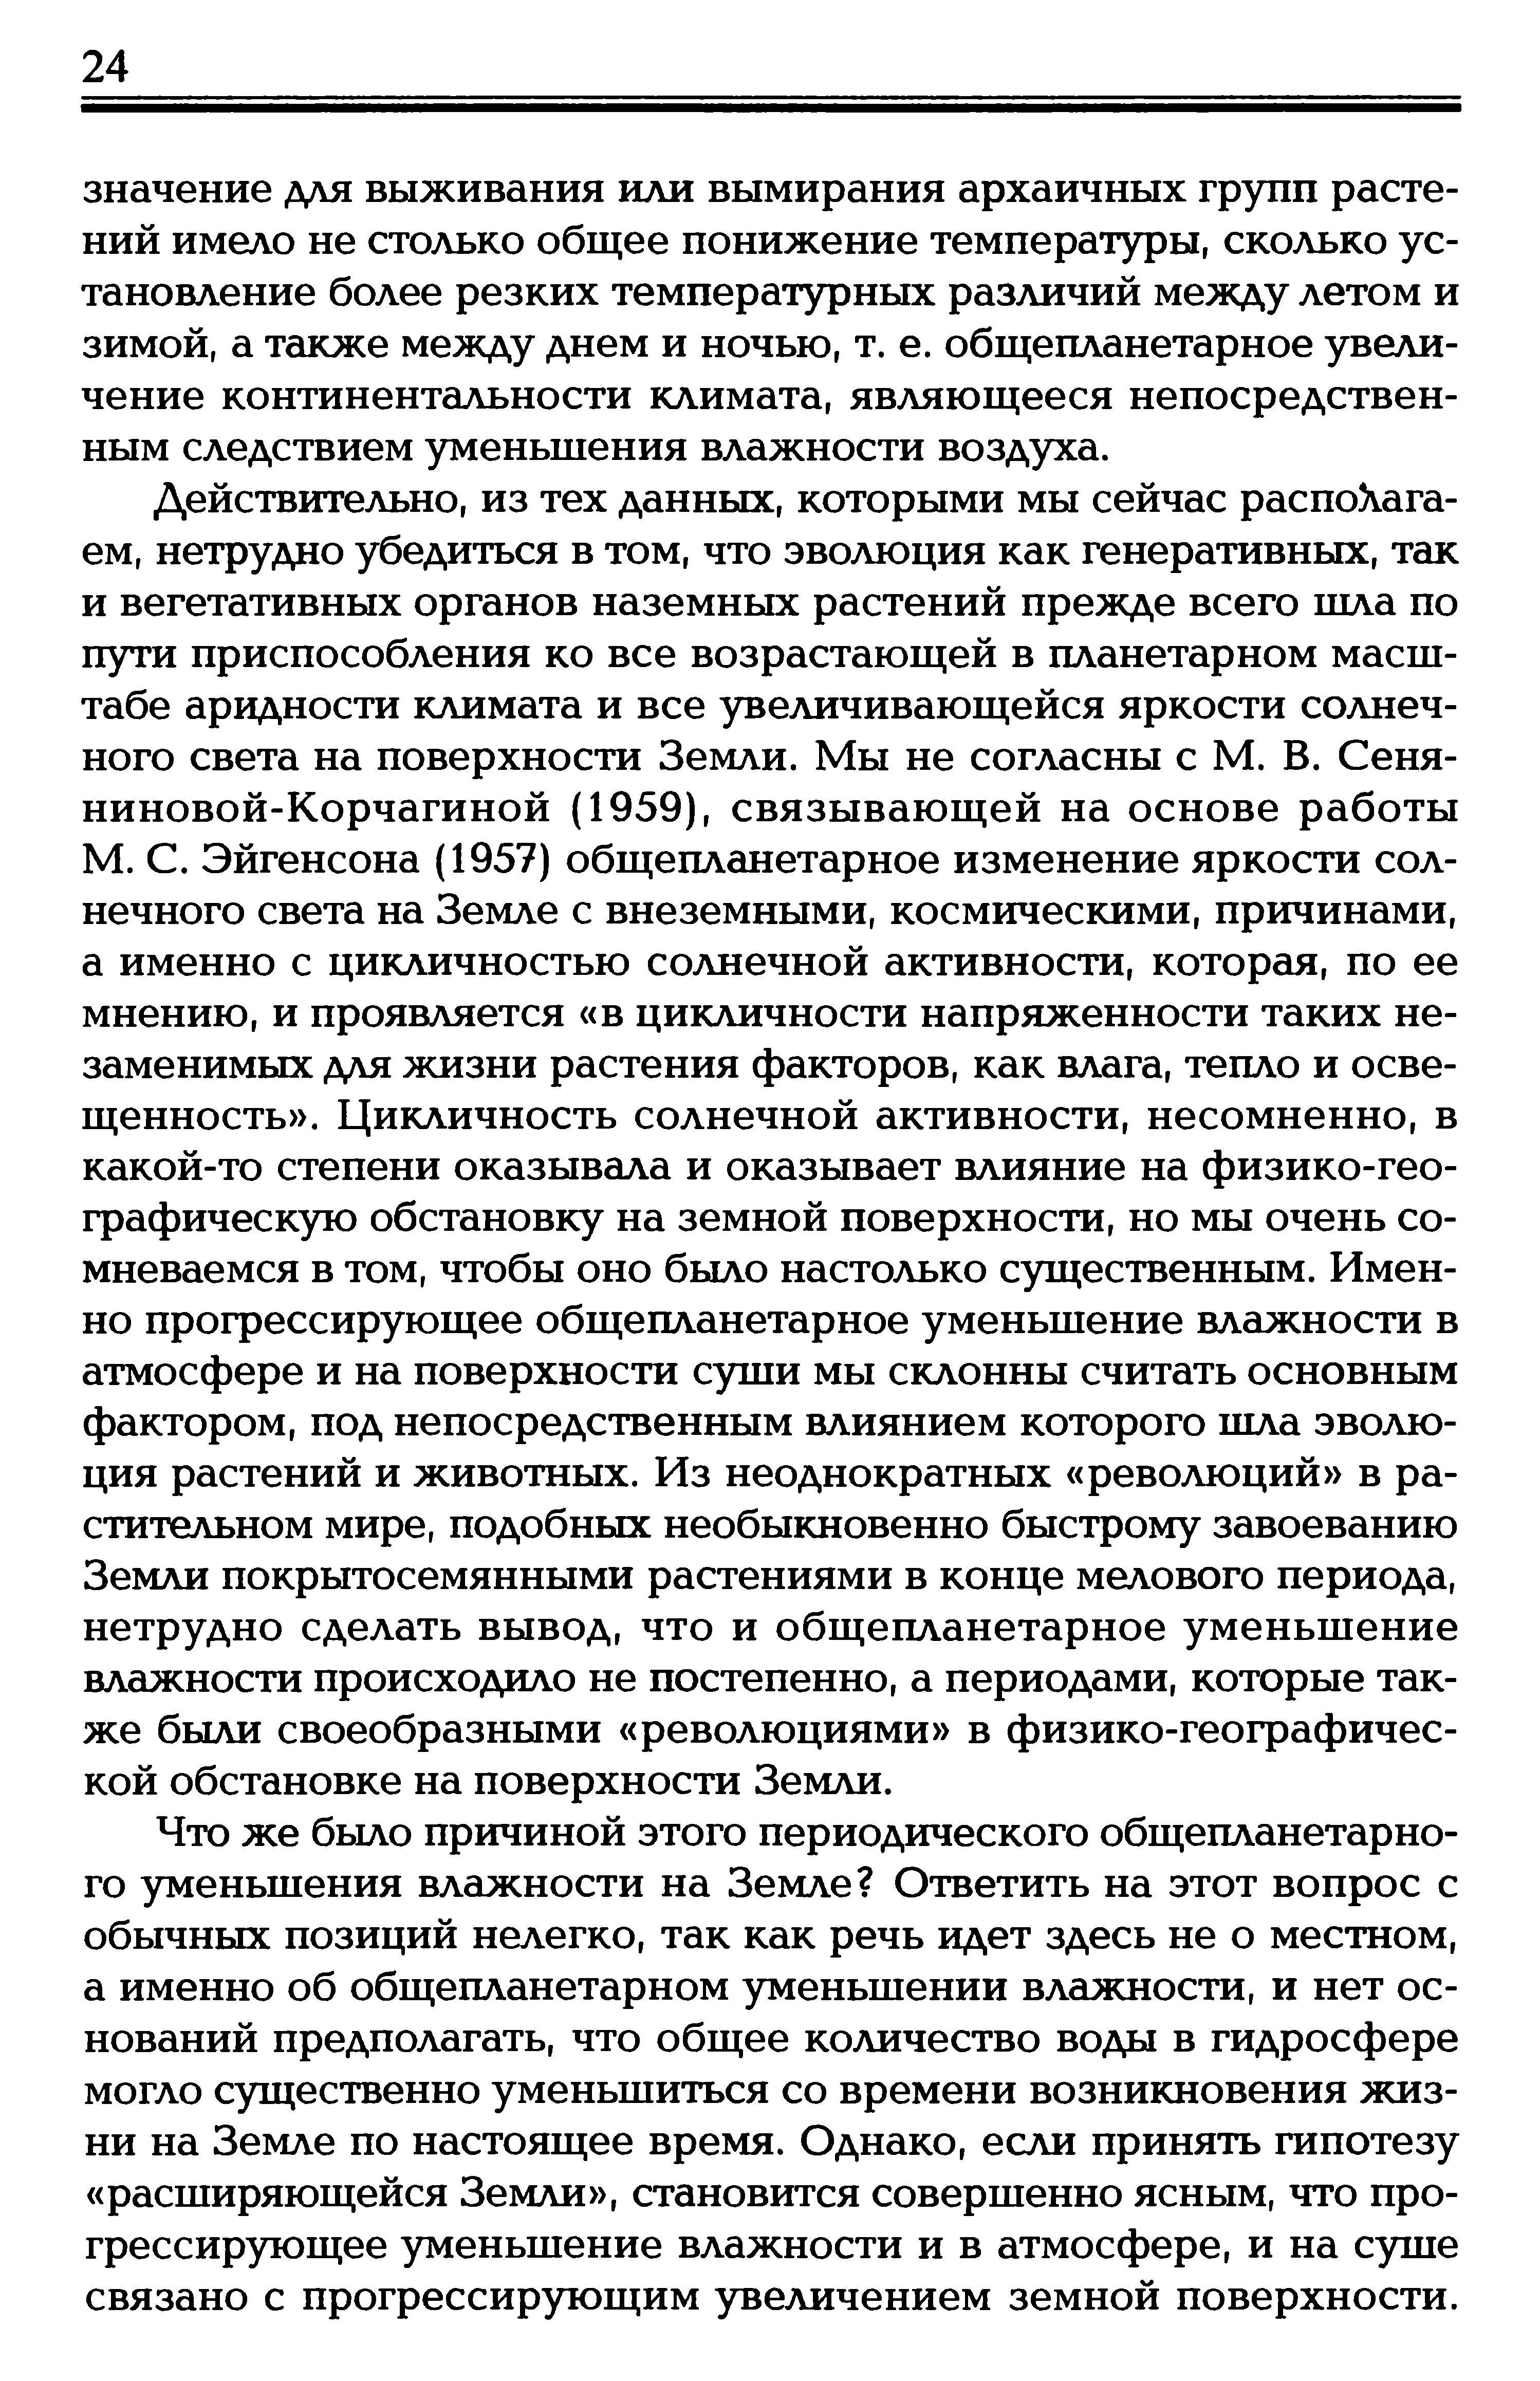 Tzvelev, 2005_1_05.jpeg